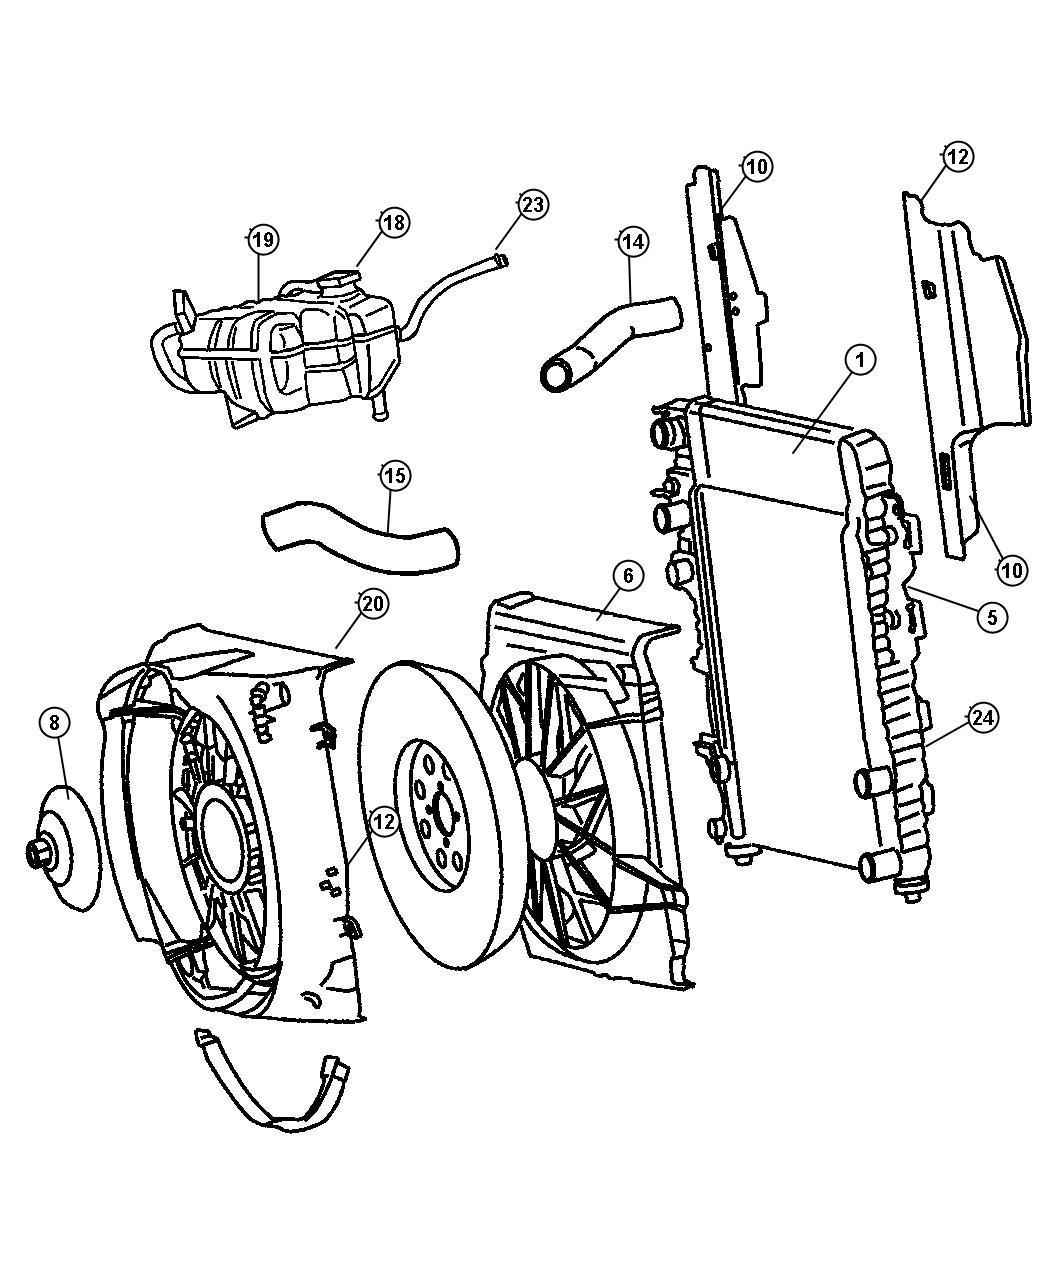 2011 Dodge Ram 3500 Isolator. Lower, upper. Radiator. Air